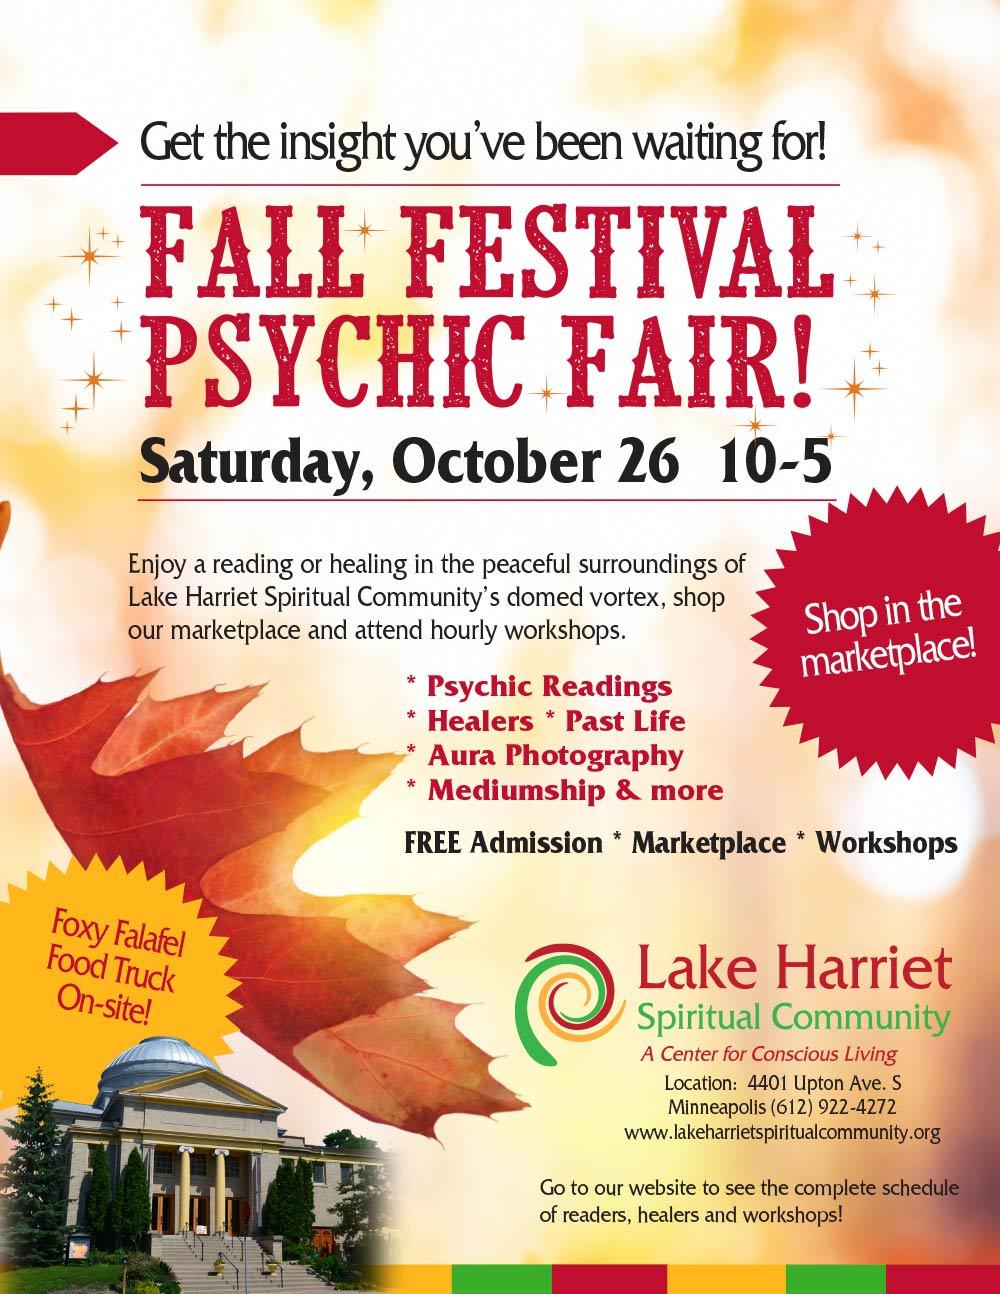 Lake Harriet Spiritual Community Fall Festival Psychic Fair @ Lake Harriet Spiritual Community | Minneapolis | Minnesota | United States